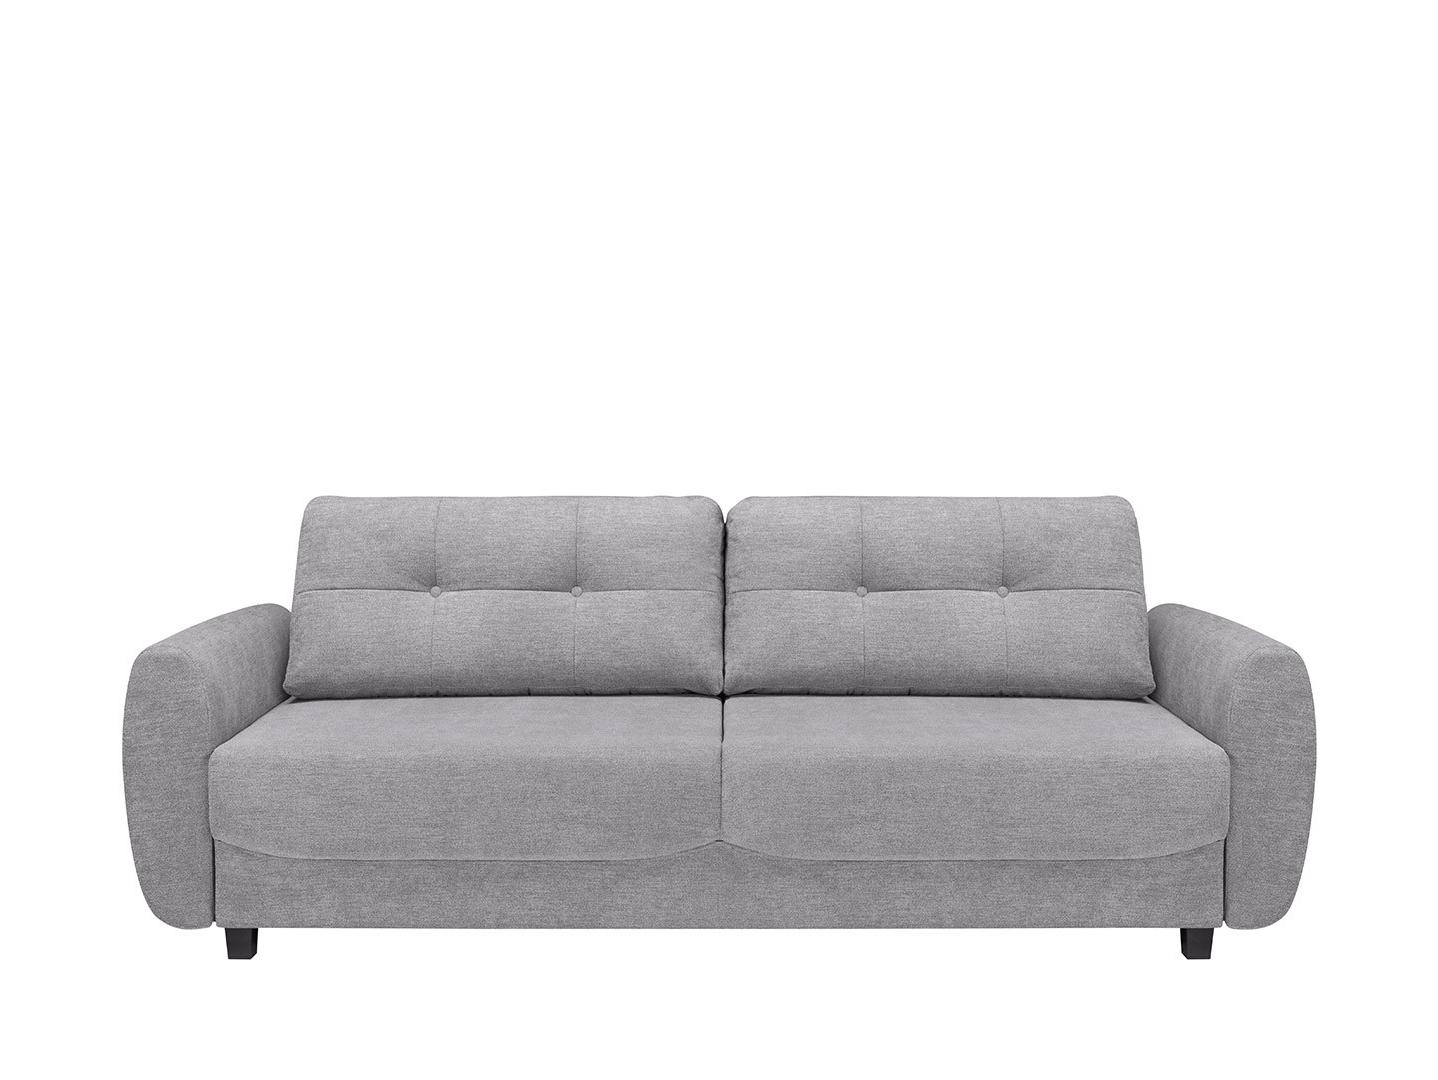 Most Recently Released Hamptons Sofas Pertaining To Sofa Hampton 236Cm X 89Cm X 96Cm 22507 – Sklep Brw (View 7 of 15)